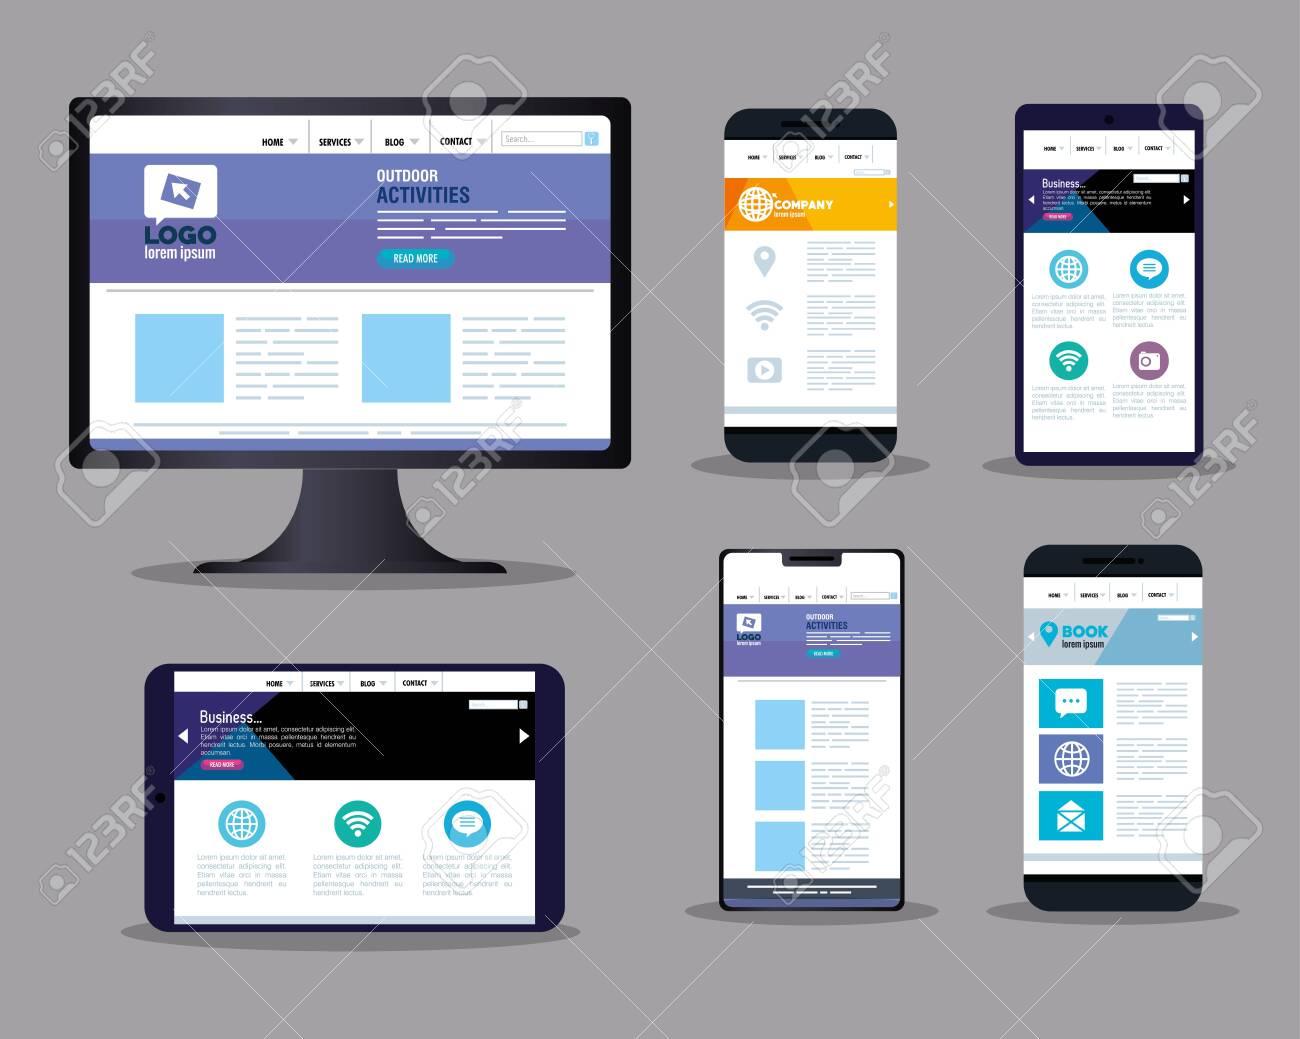 mockup responsive web, concept website development on electronics devices vector illustration design - 153514734